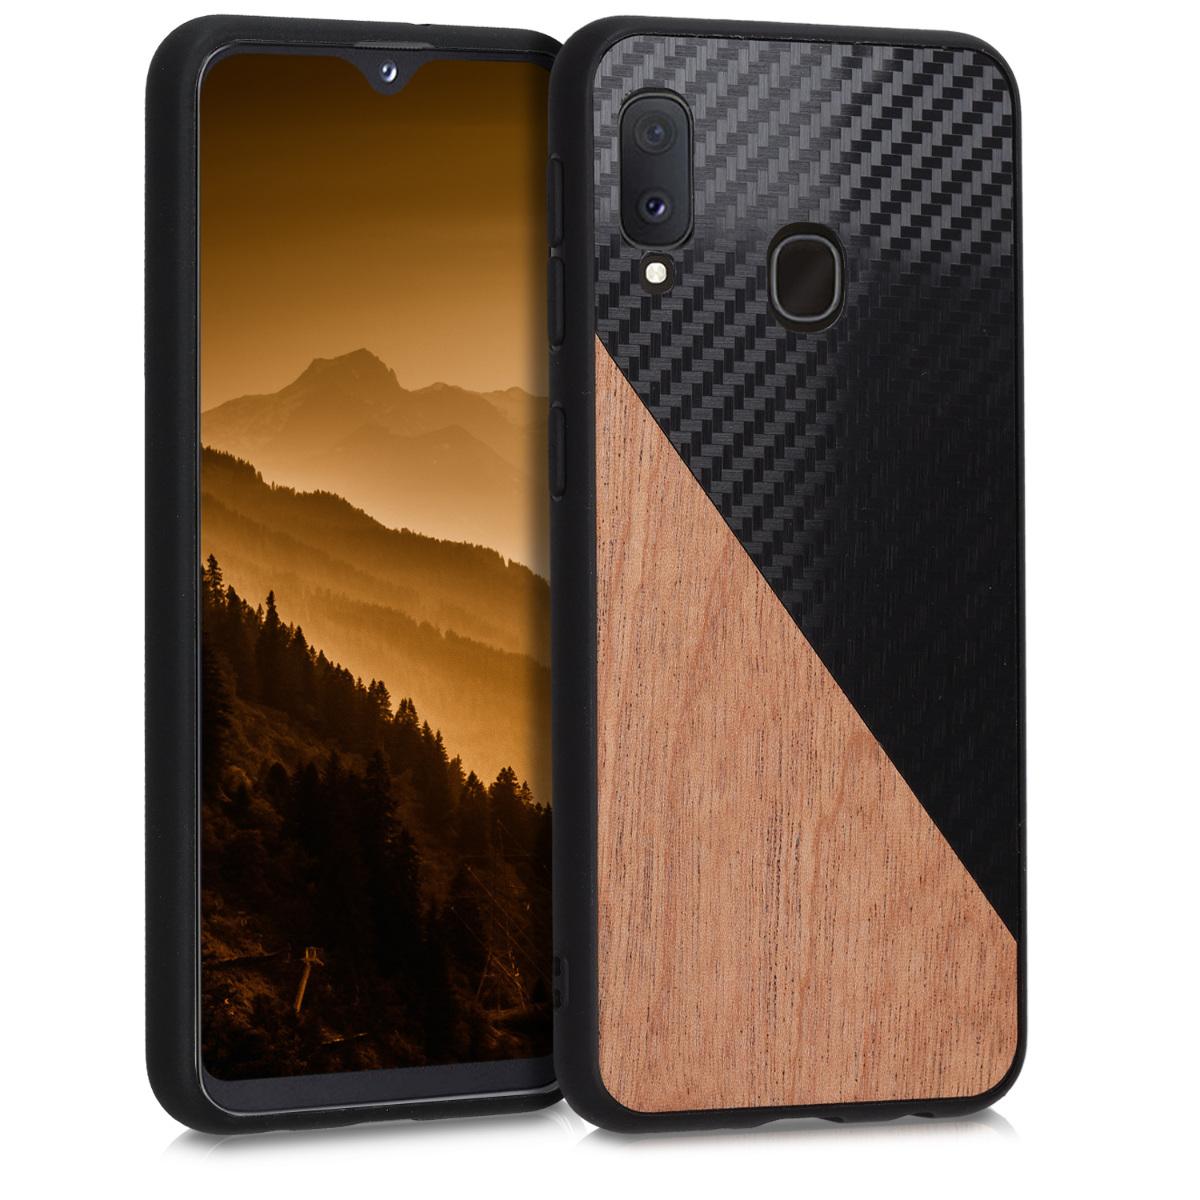 KW Σκληρή Θήκη Samsung Galaxy A20e - TPU Bumper and Wood / Carbon Fiber - Dark Brown / Black (51000.01)